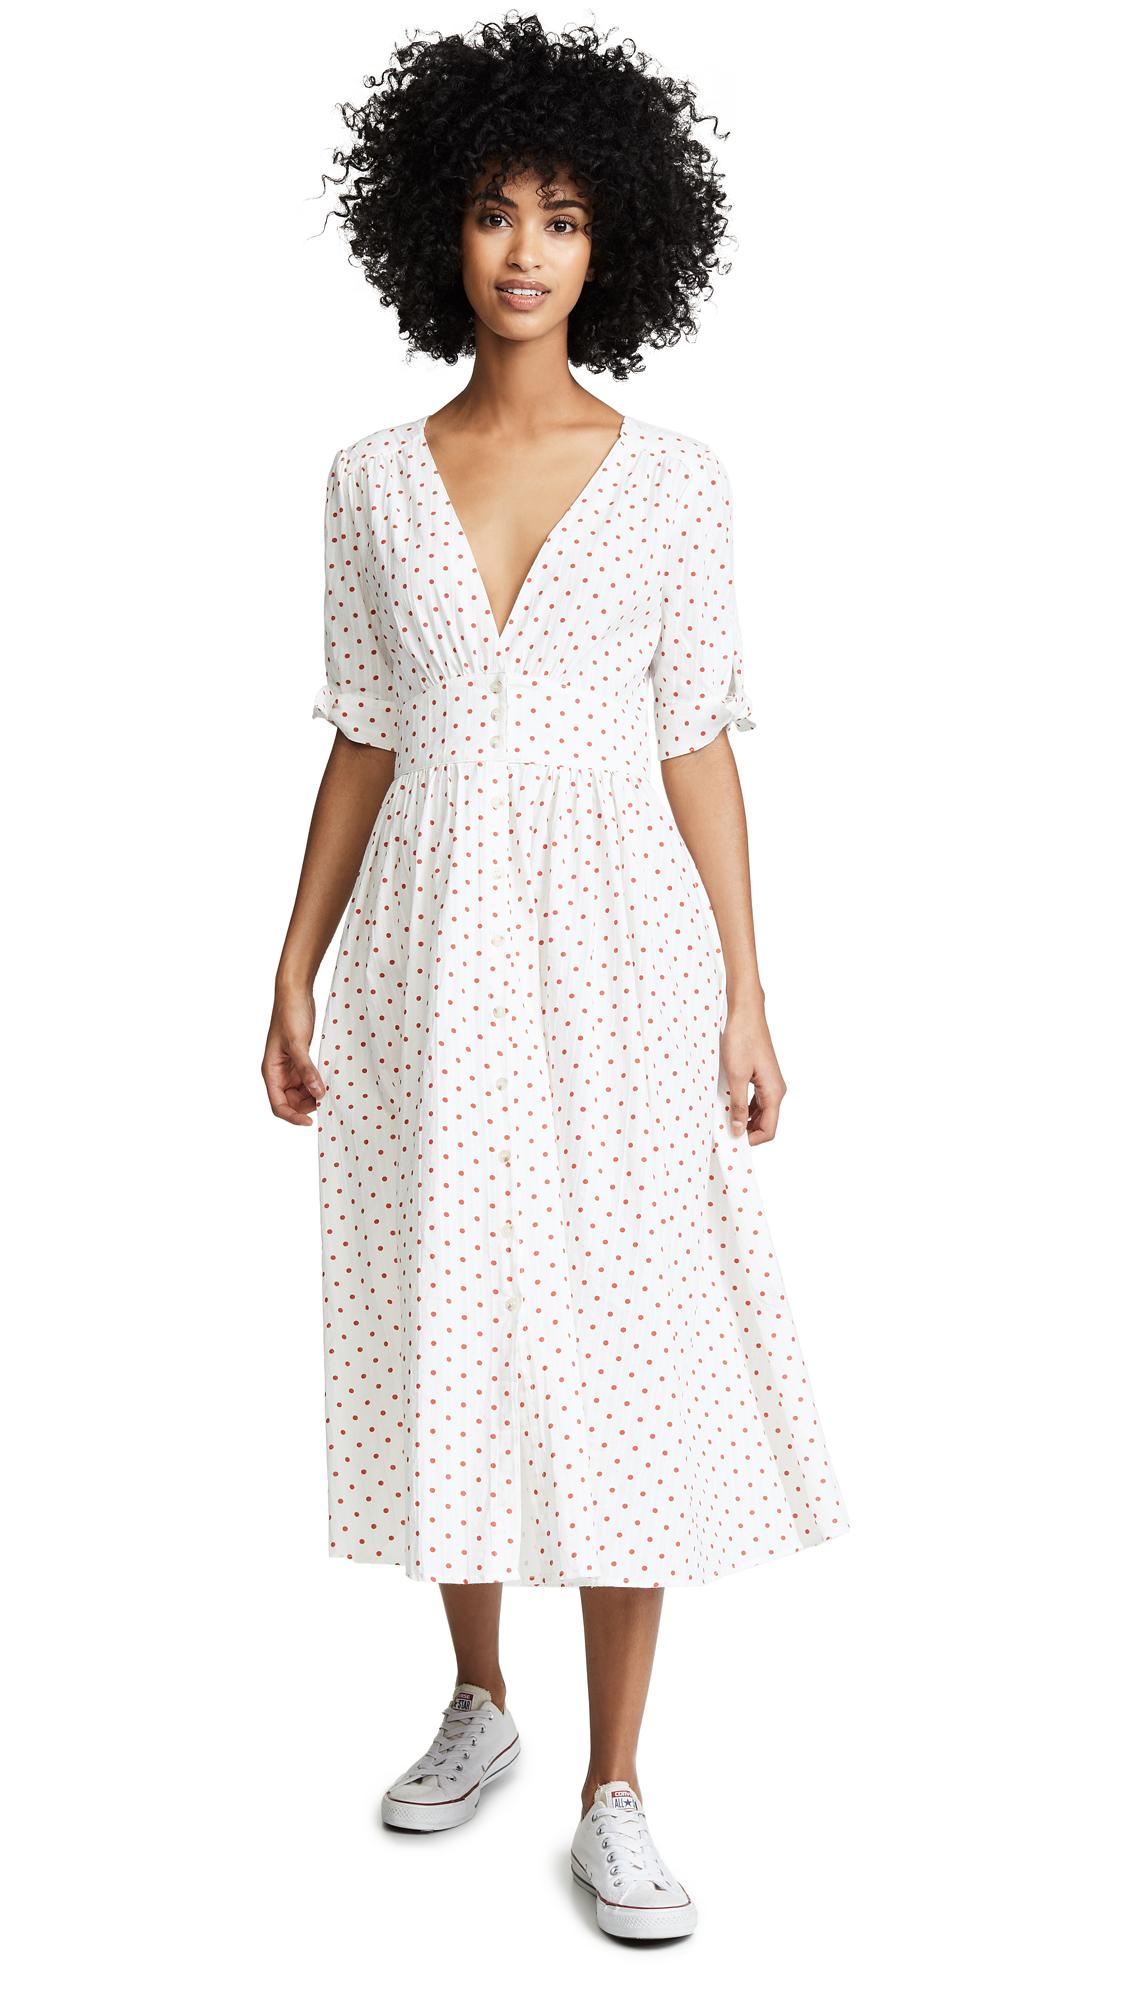 NIGHTWALKER Ludlow Dress in White/Red Polka Dot